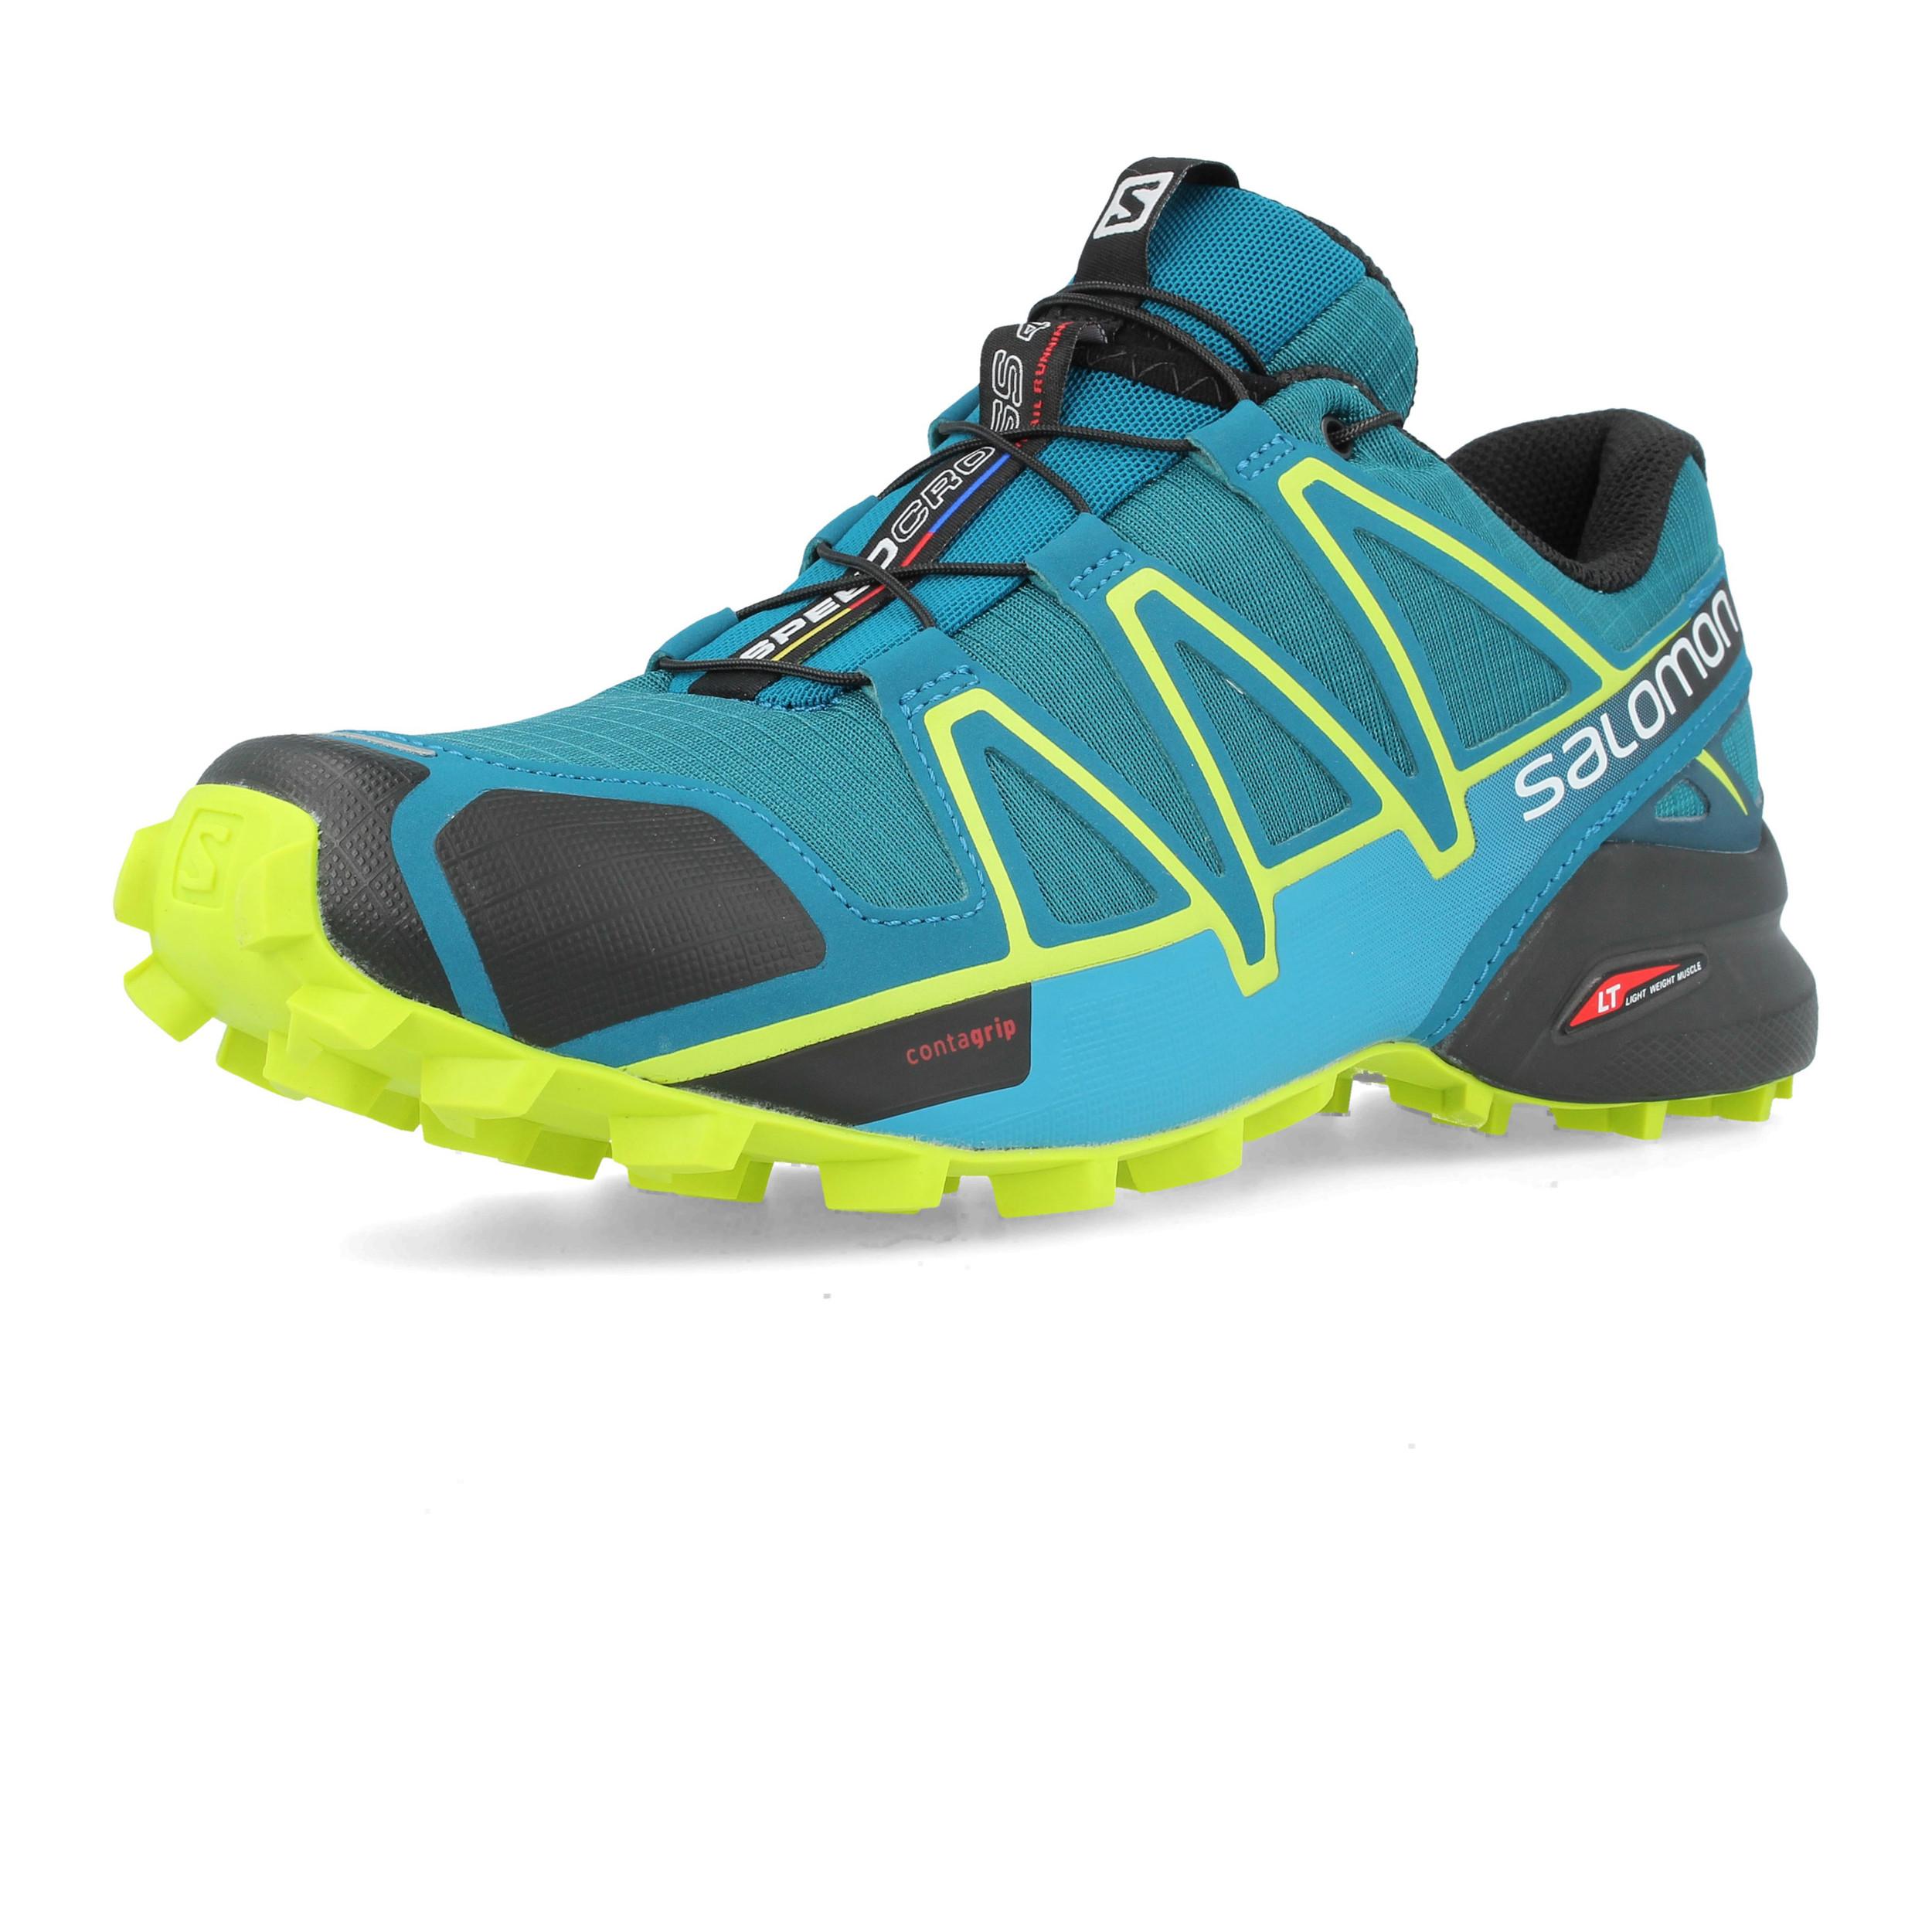 d6bb319b4d8b Details about Salomon Mens Speedcross 4 Trail Running Shoes Trainers  Sneakers Sport Blue Green